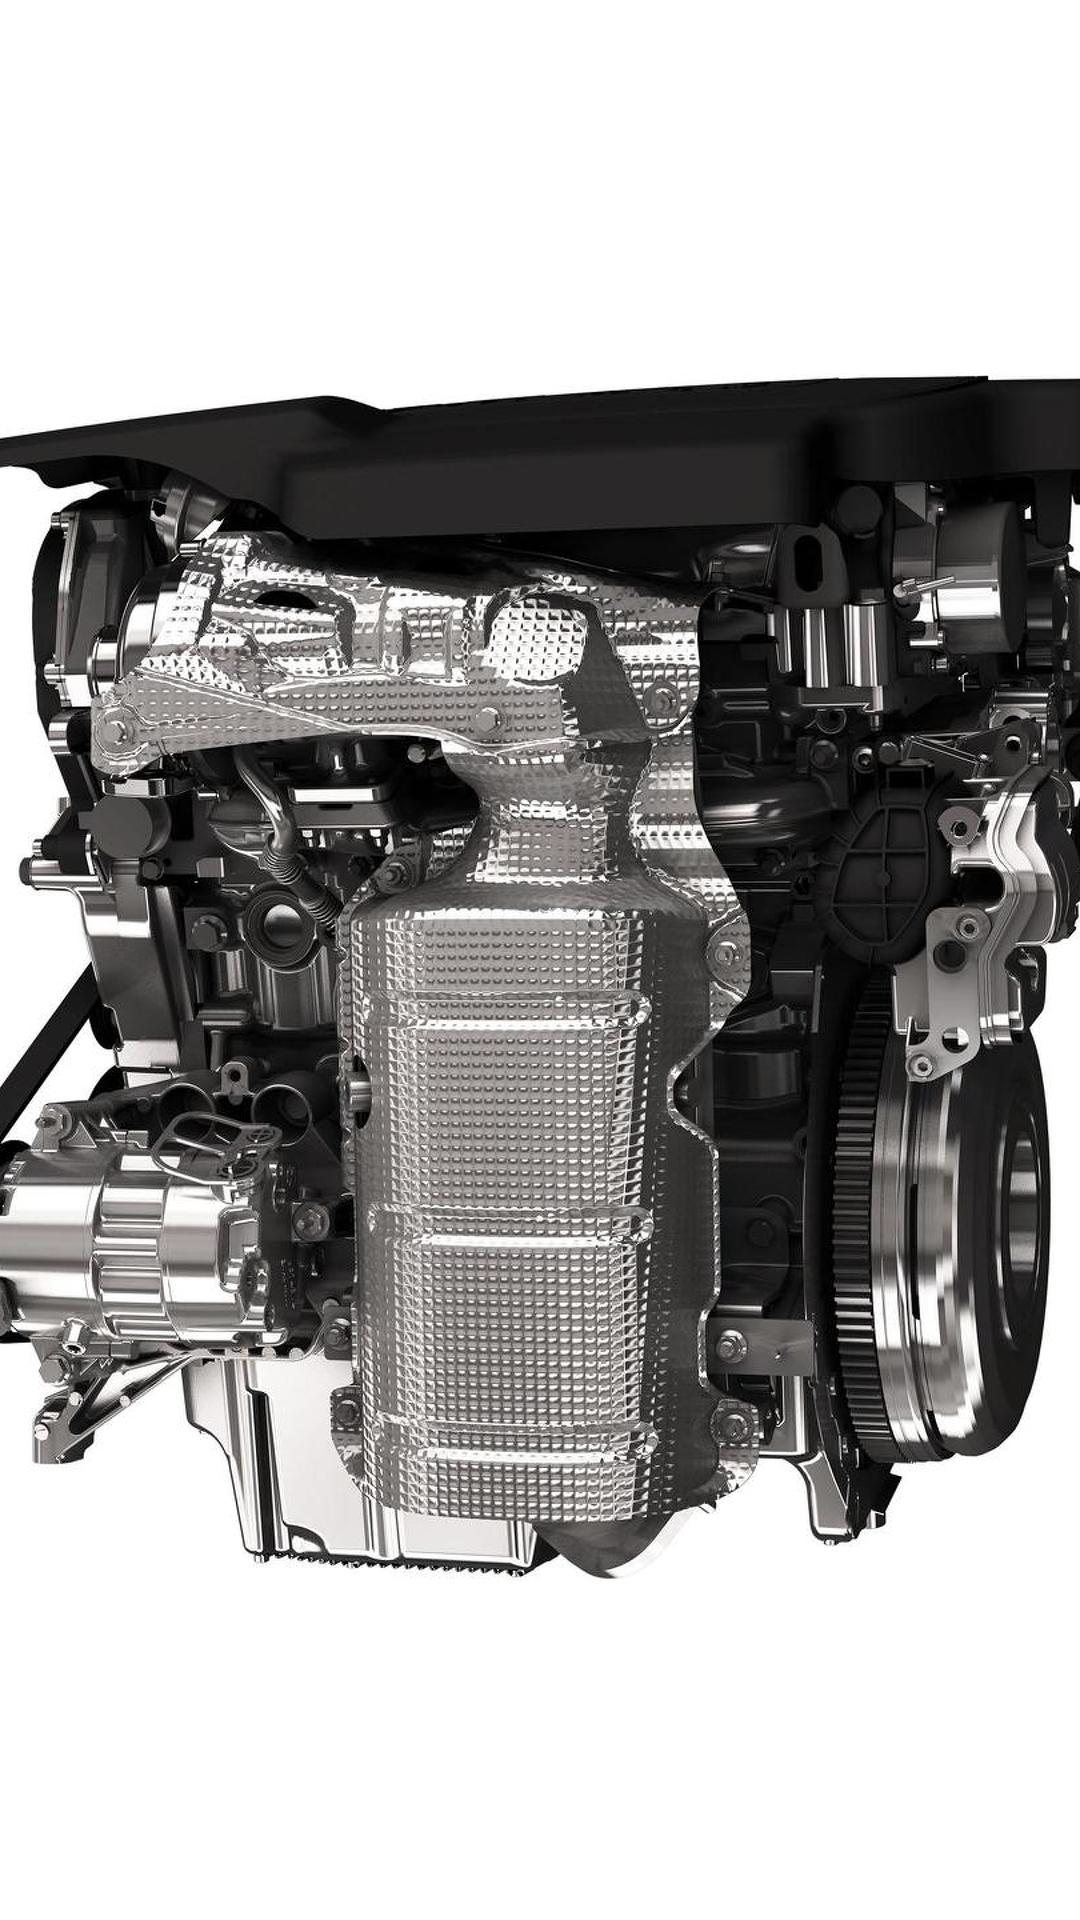 starter spare fiat multijet omega product motor ducato engine bosch